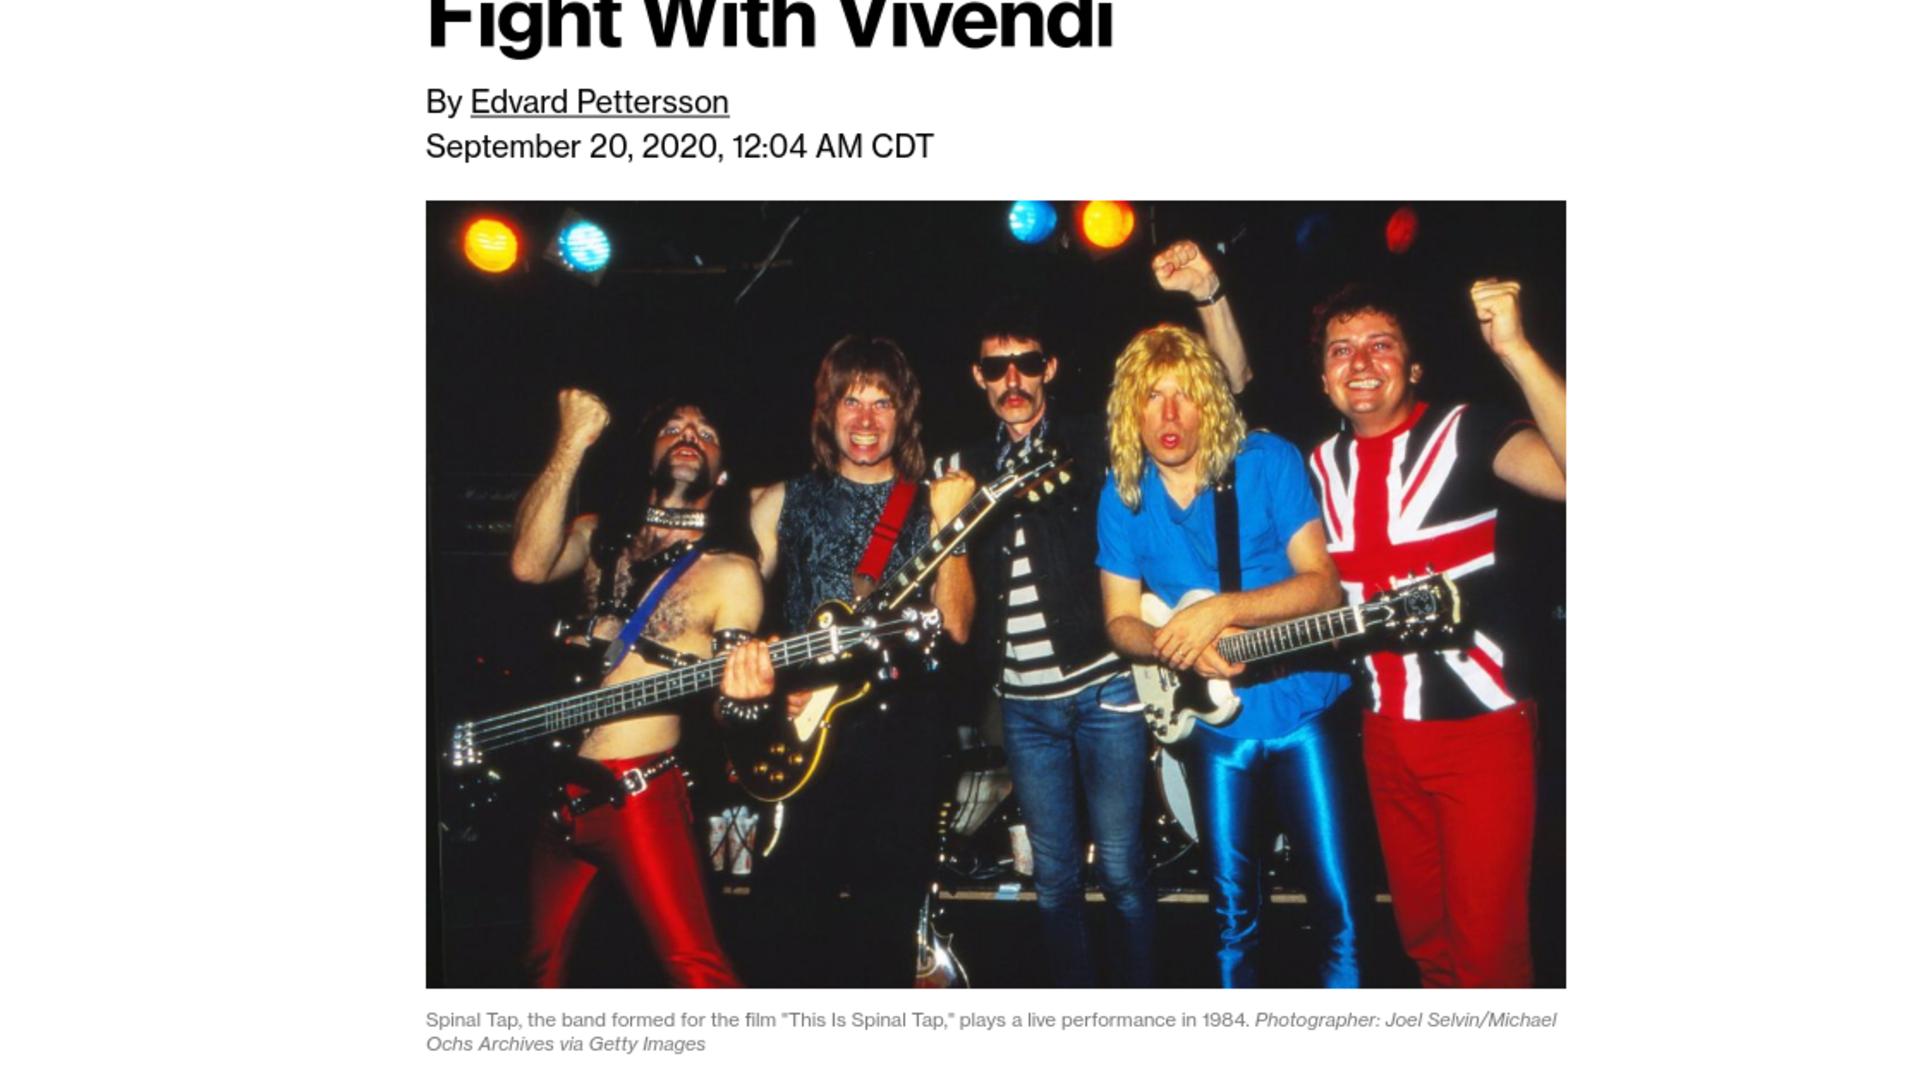 Fairness Rocks News 'Spinal Tap' Creators Settle Royalties Fight With Vivendi